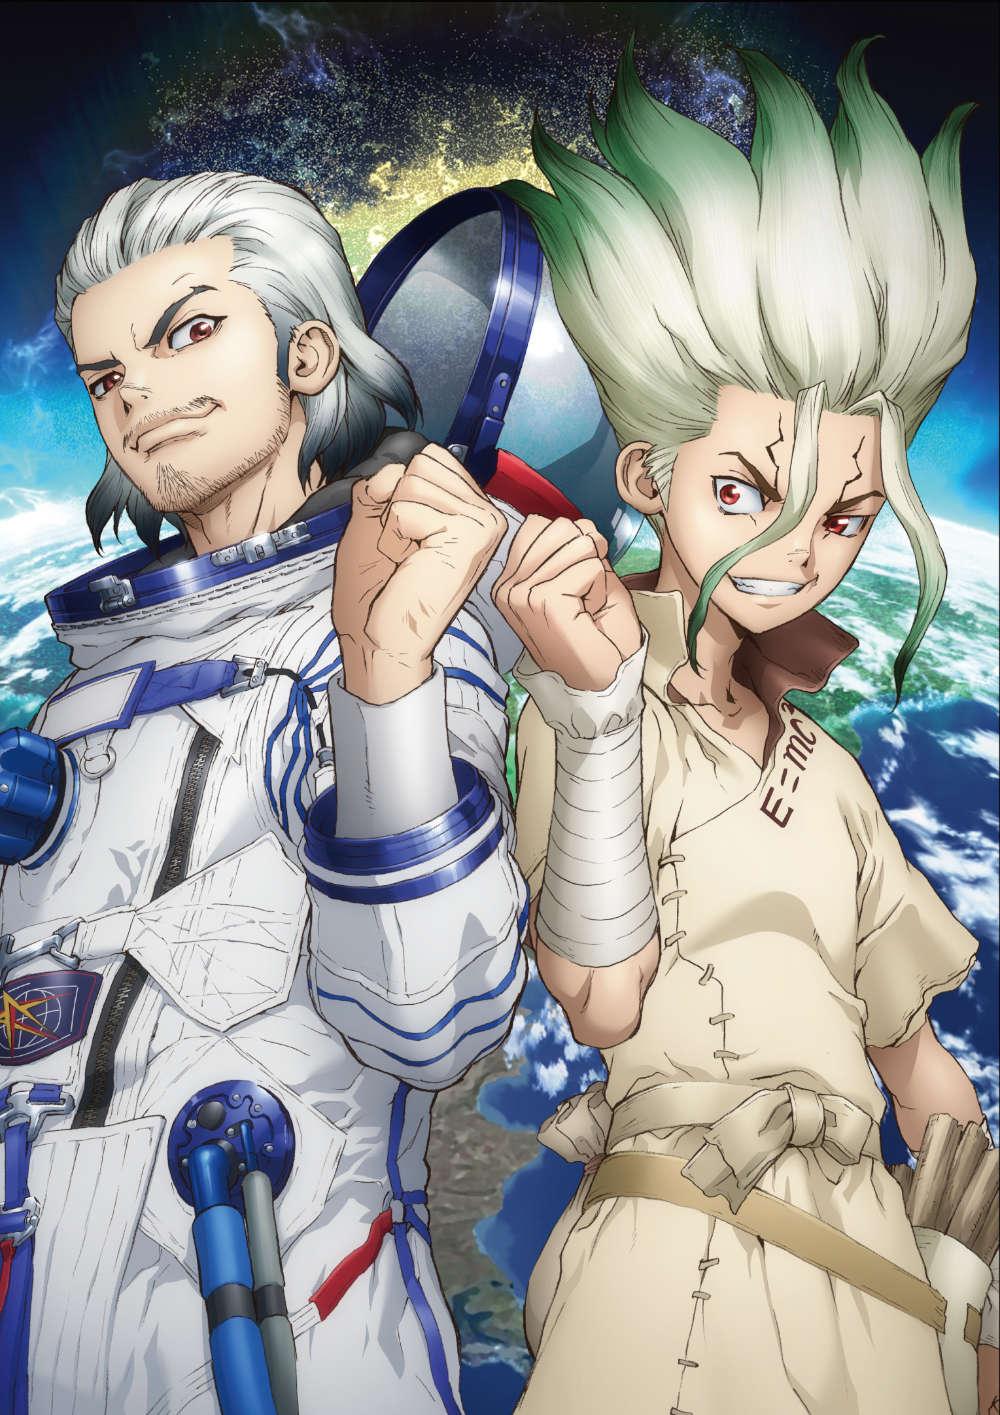 Dr.STONE ドクターストーン Vol.6 Blu-ray【初回生産限定版】